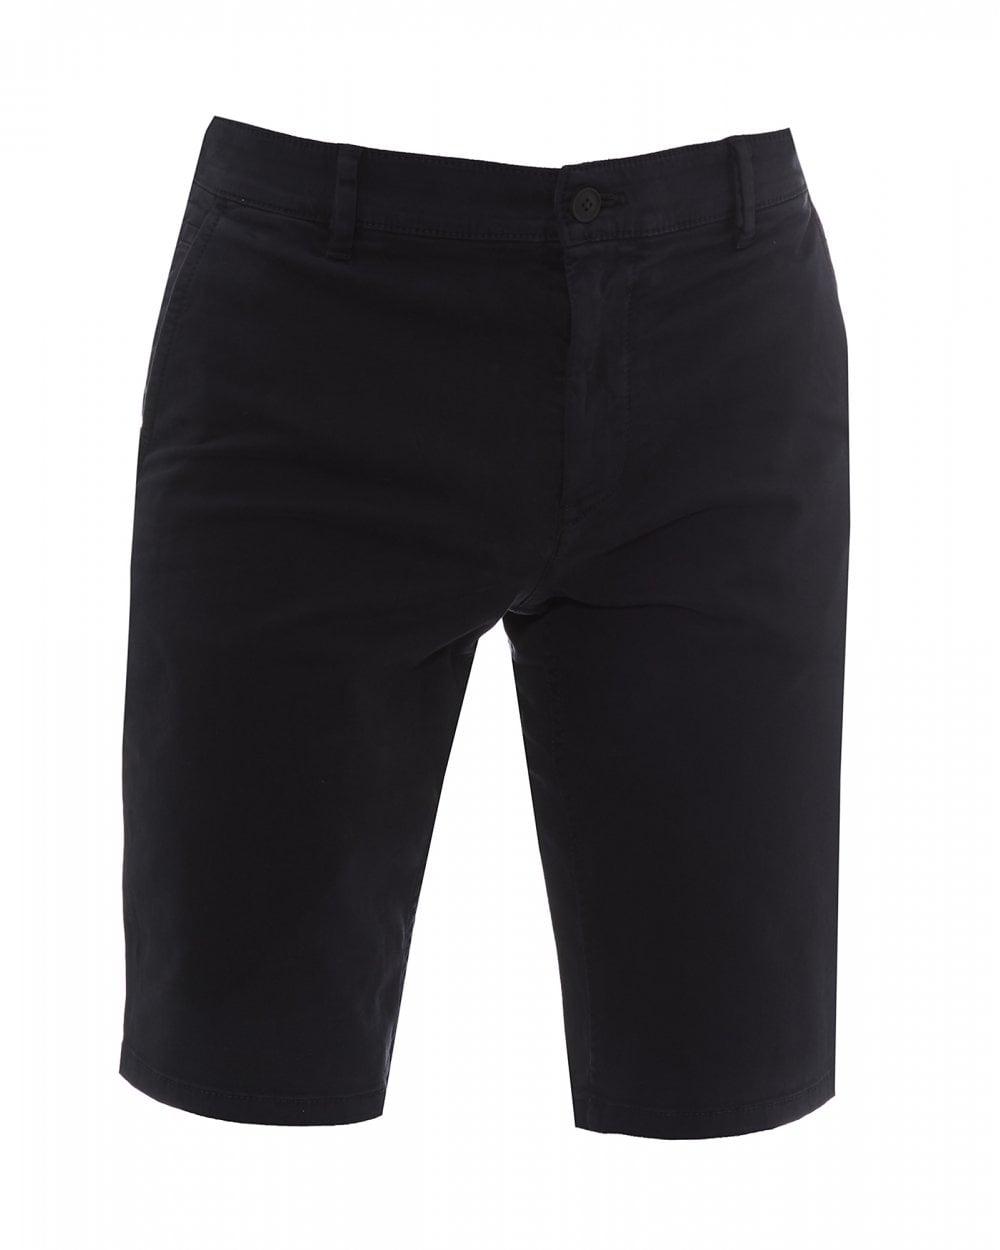 9c0d63415 BOSS Casual Mens Schino Slim Fit Navy Blue Shorts